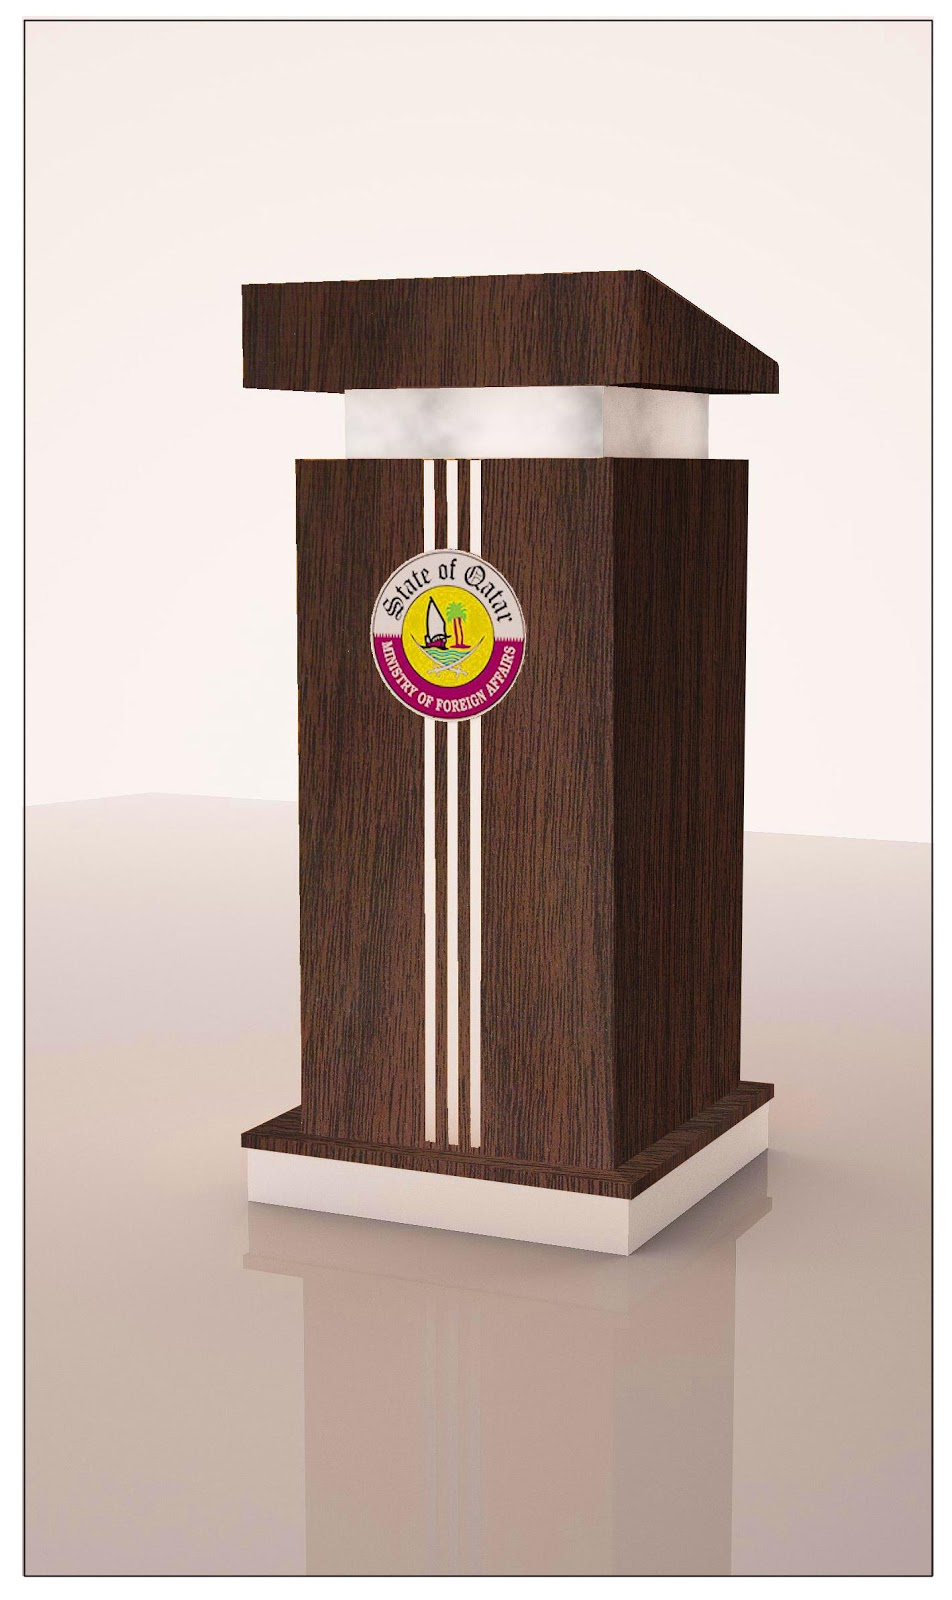 ... 081012_02 similiar podium designs keywords on plans to build a podium